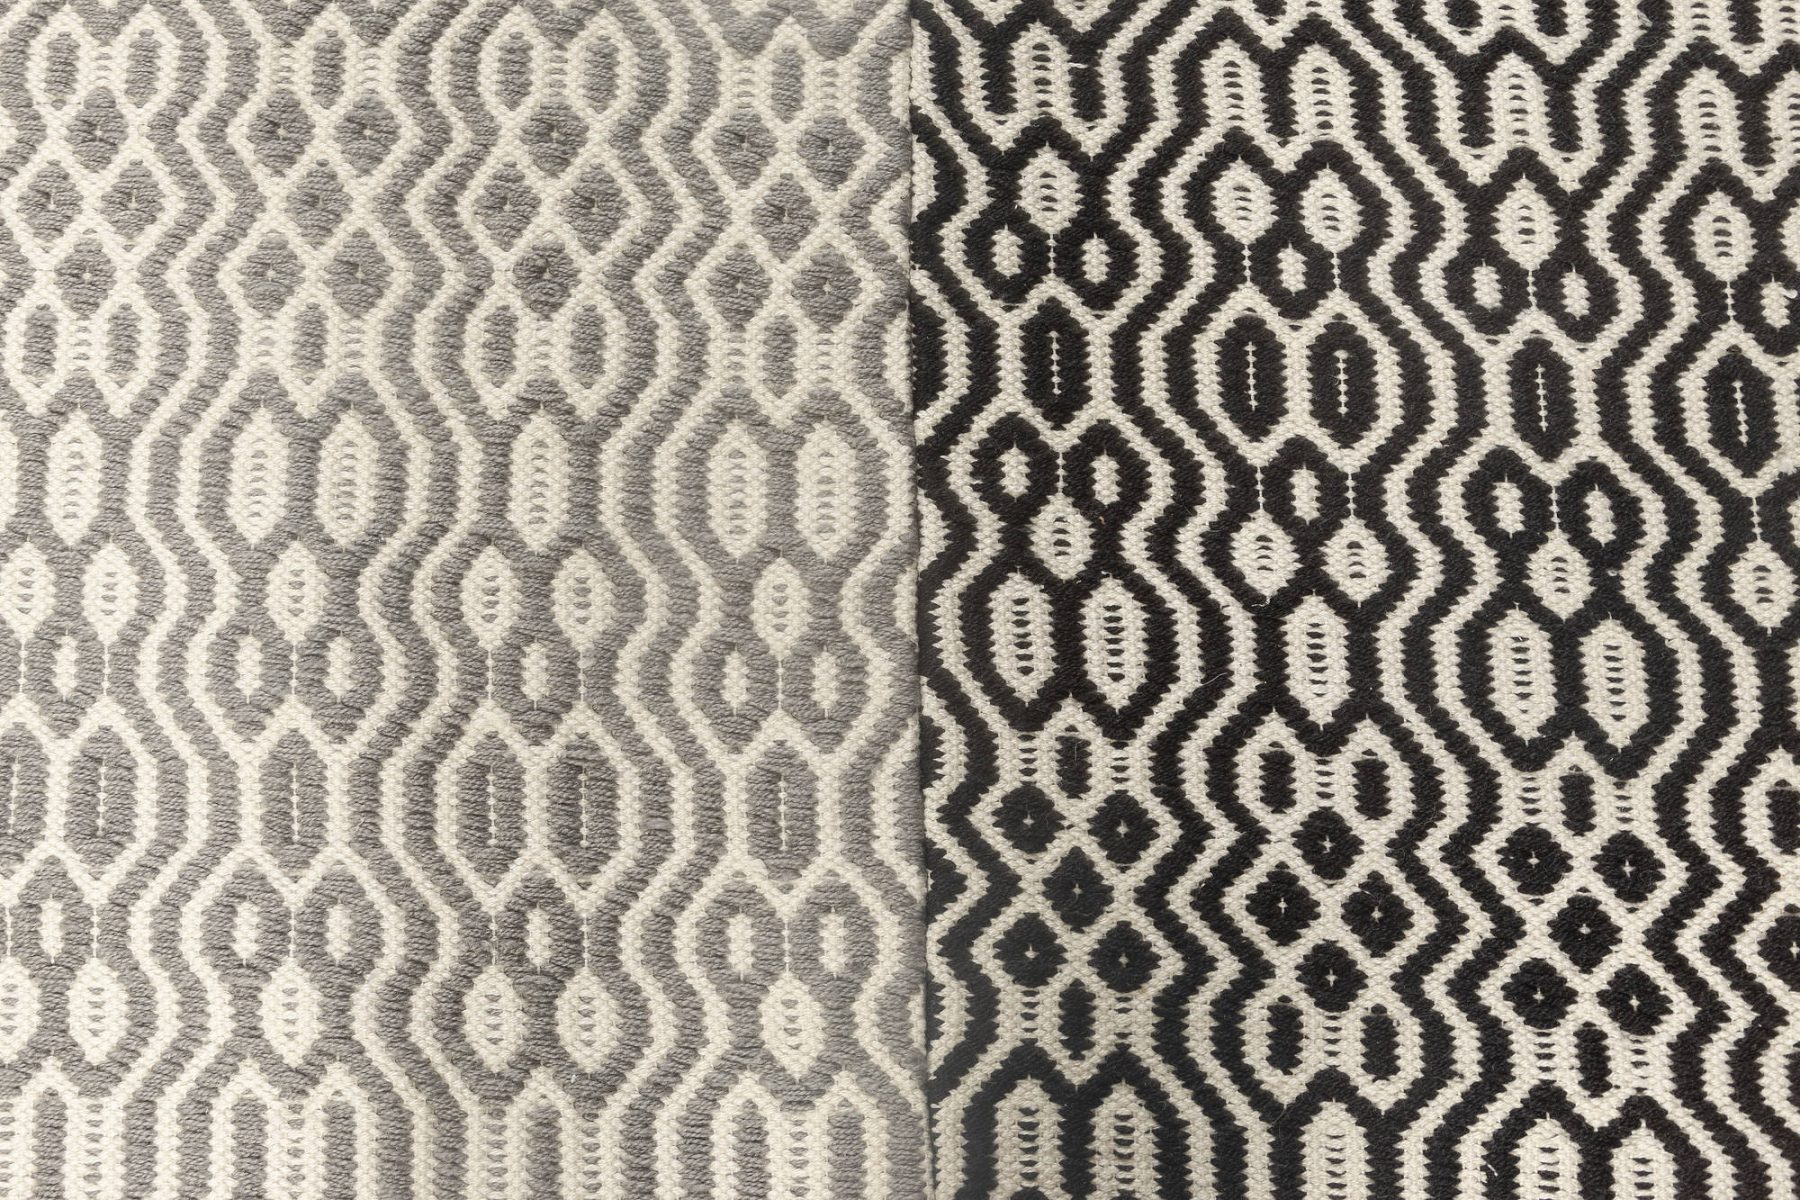 Chessboard Pattern White, Black & Light Gray Flat weave Wool Rug N11859